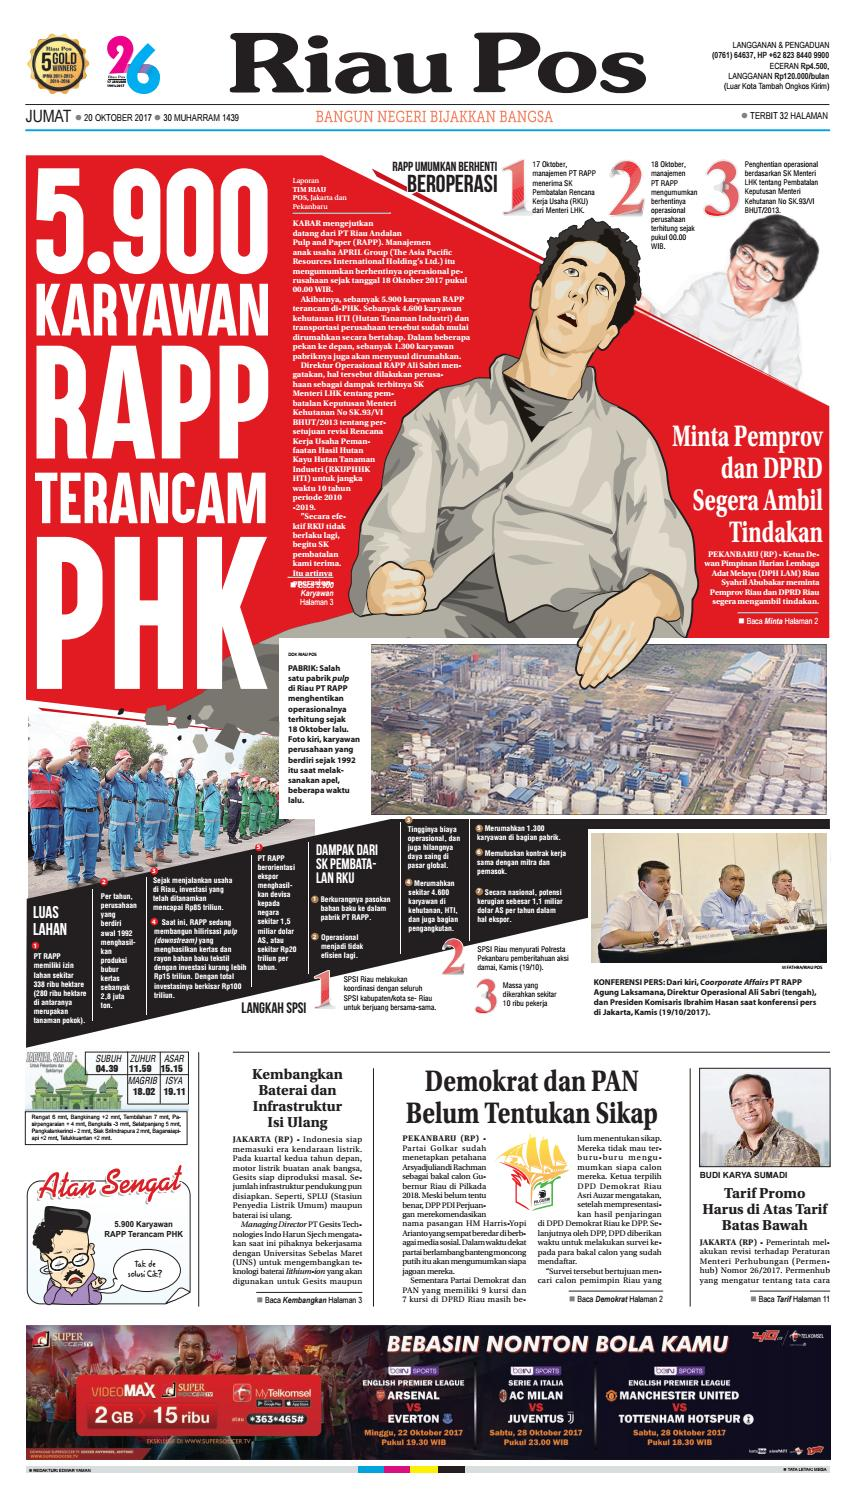 2017 10 20 By Riau Pos Issuu Produk Ukm Bumn Bahan Songket Sulam Katun Merah